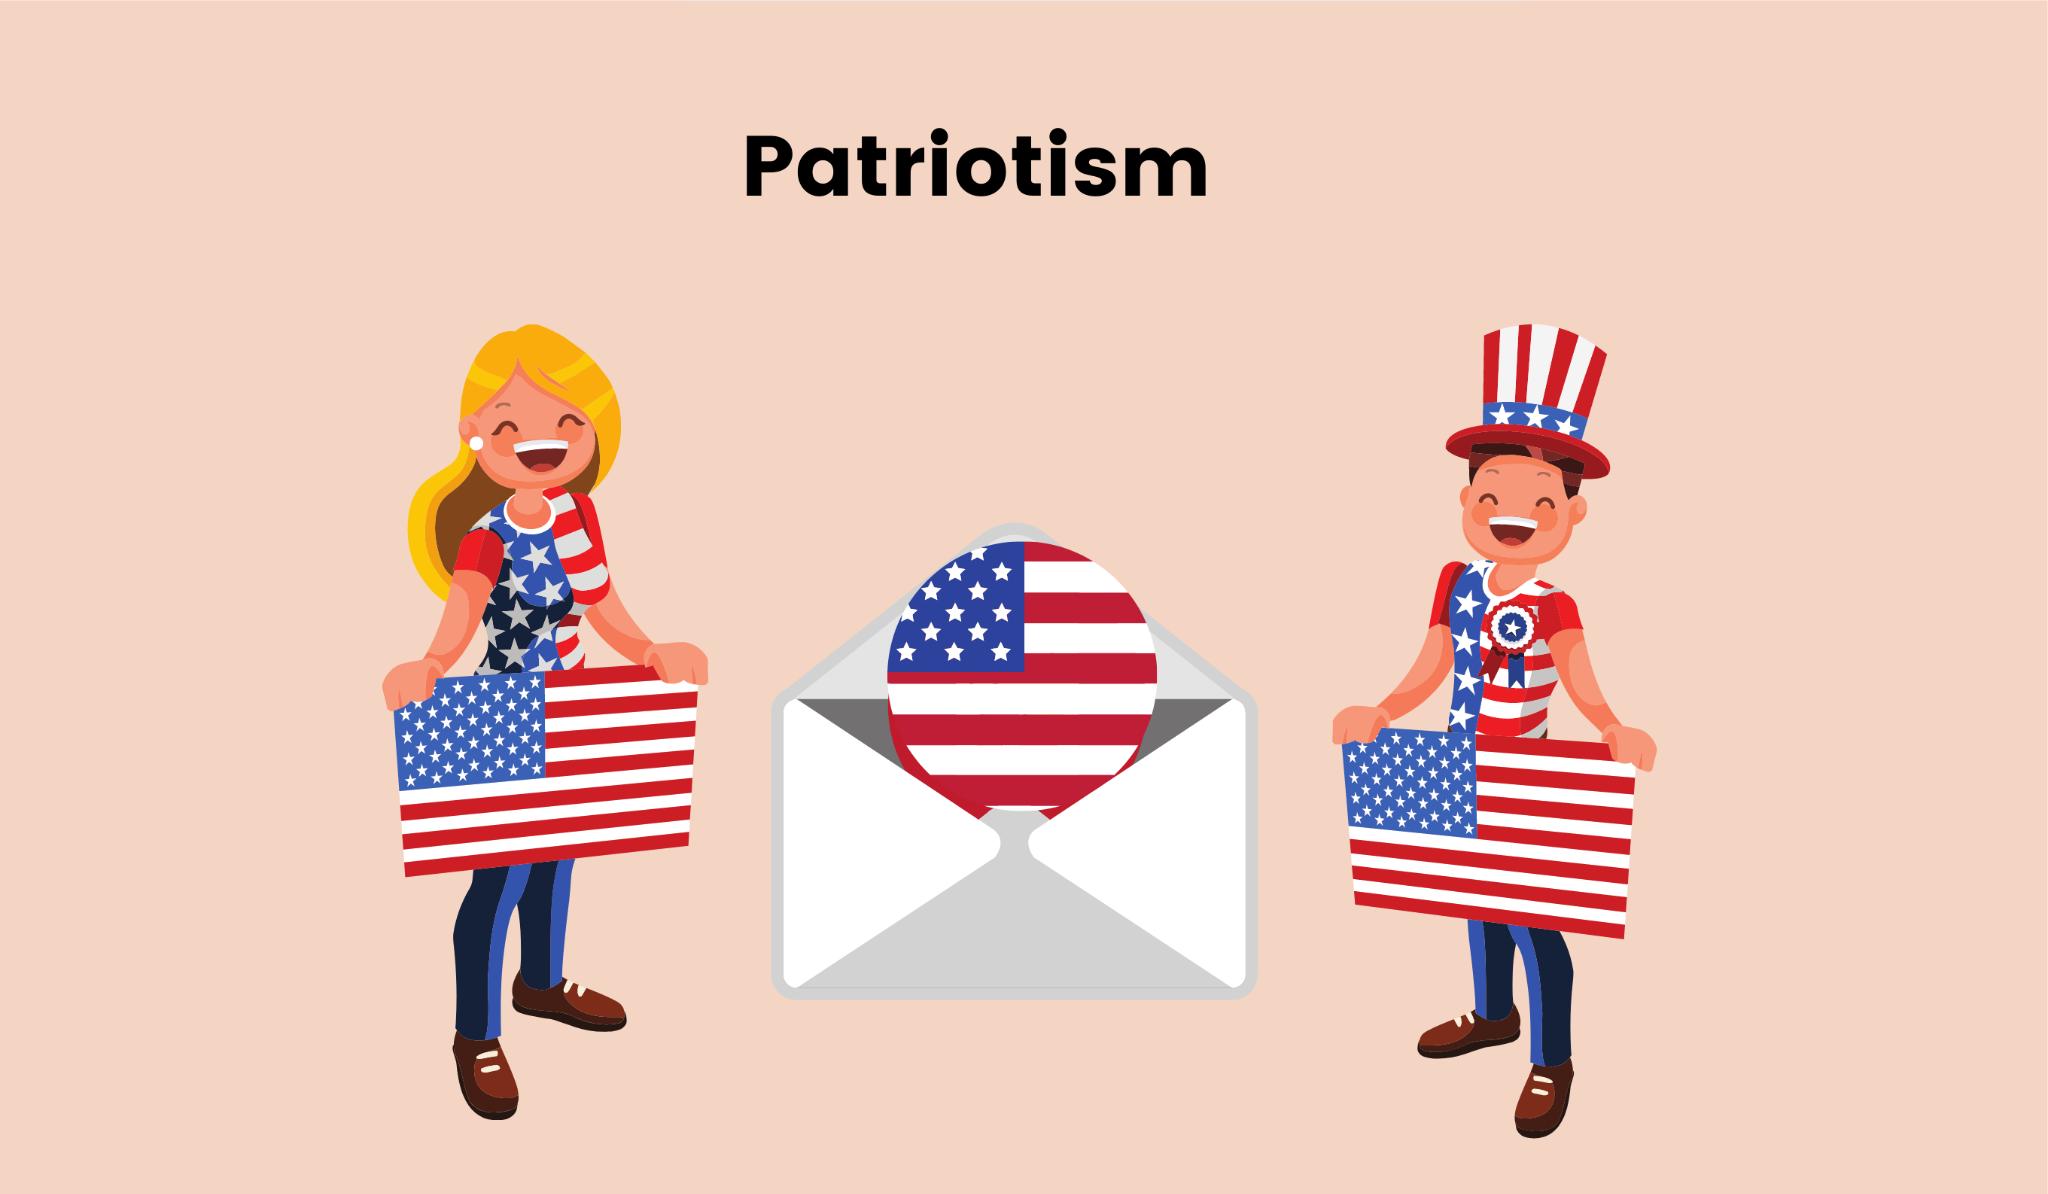 Show patriotism in Labor Day email design